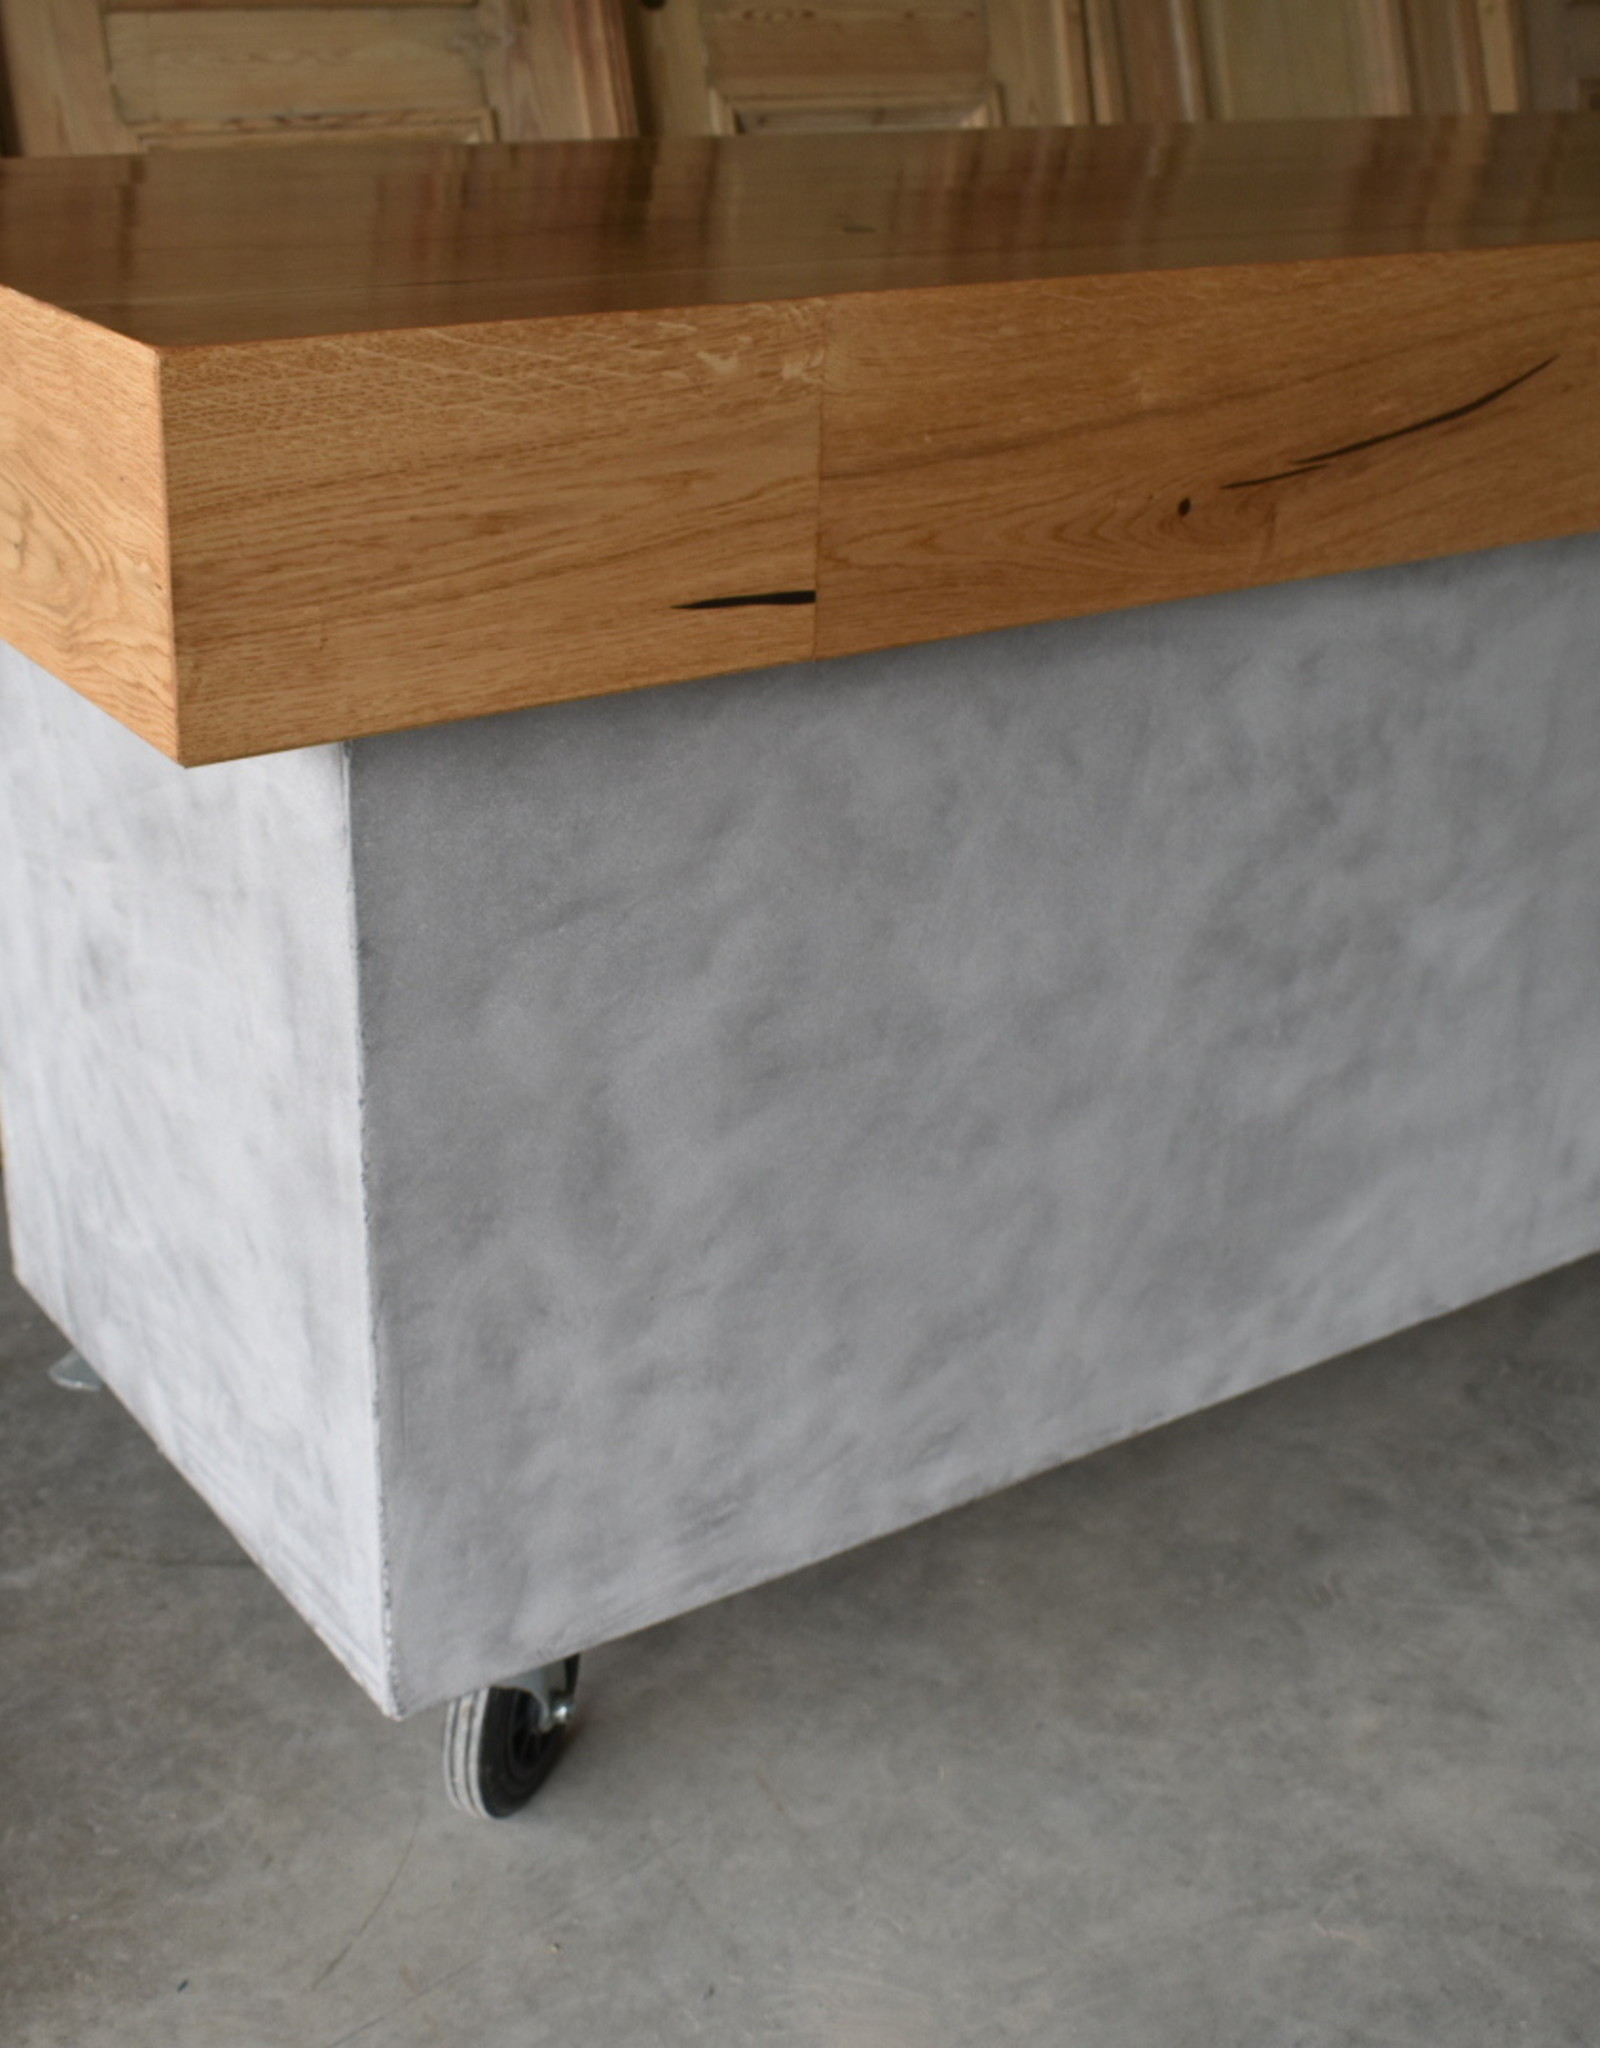 Moderner Theke Beton und Holz Vintage / Industrie